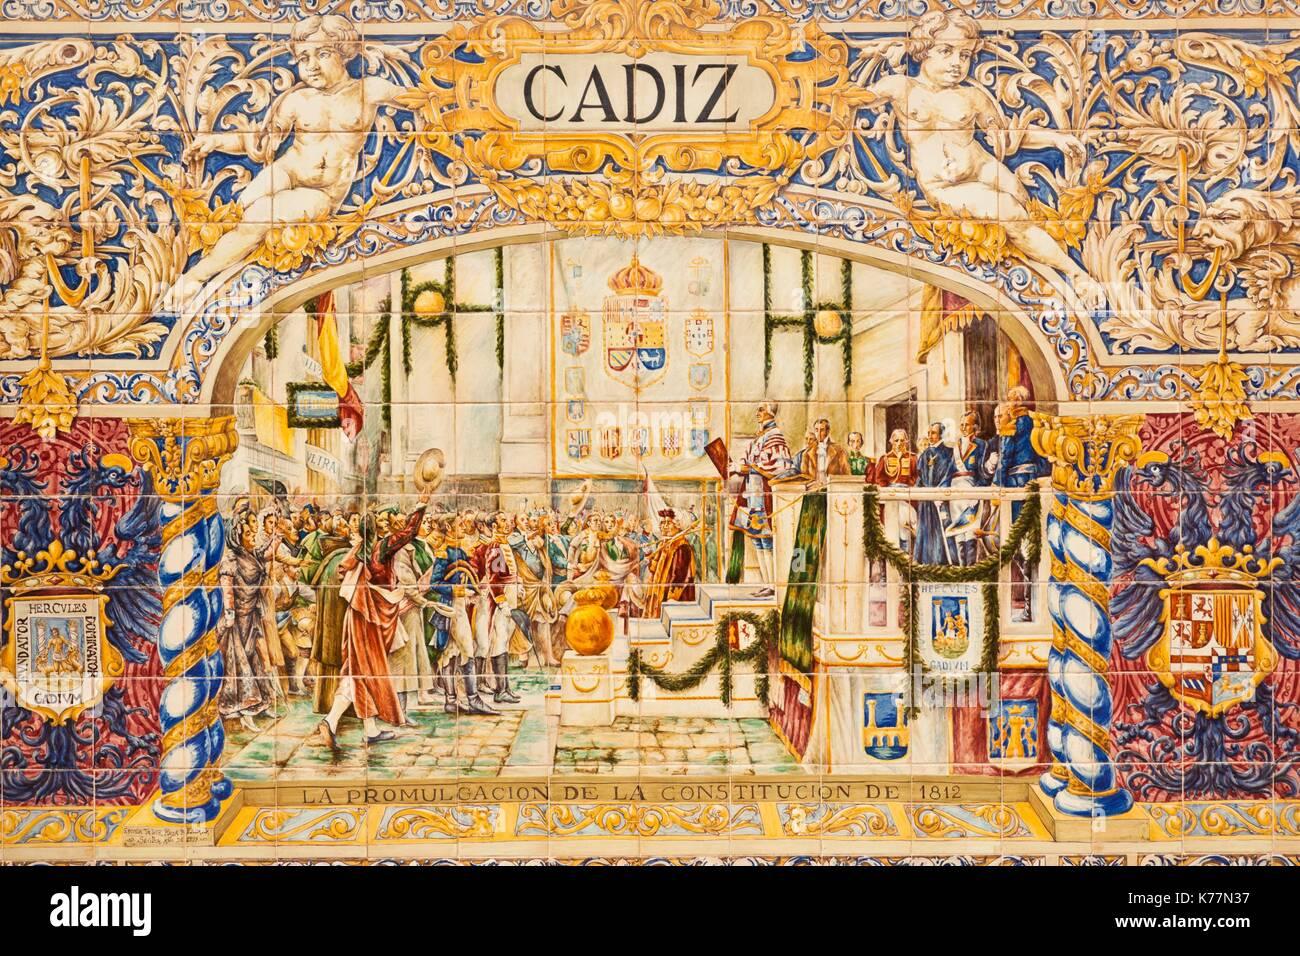 Spanien, Andalusien, Provinz Sevilla, Sevilla, Plaza Espana, Cadiz Fliese Wand Stockbild